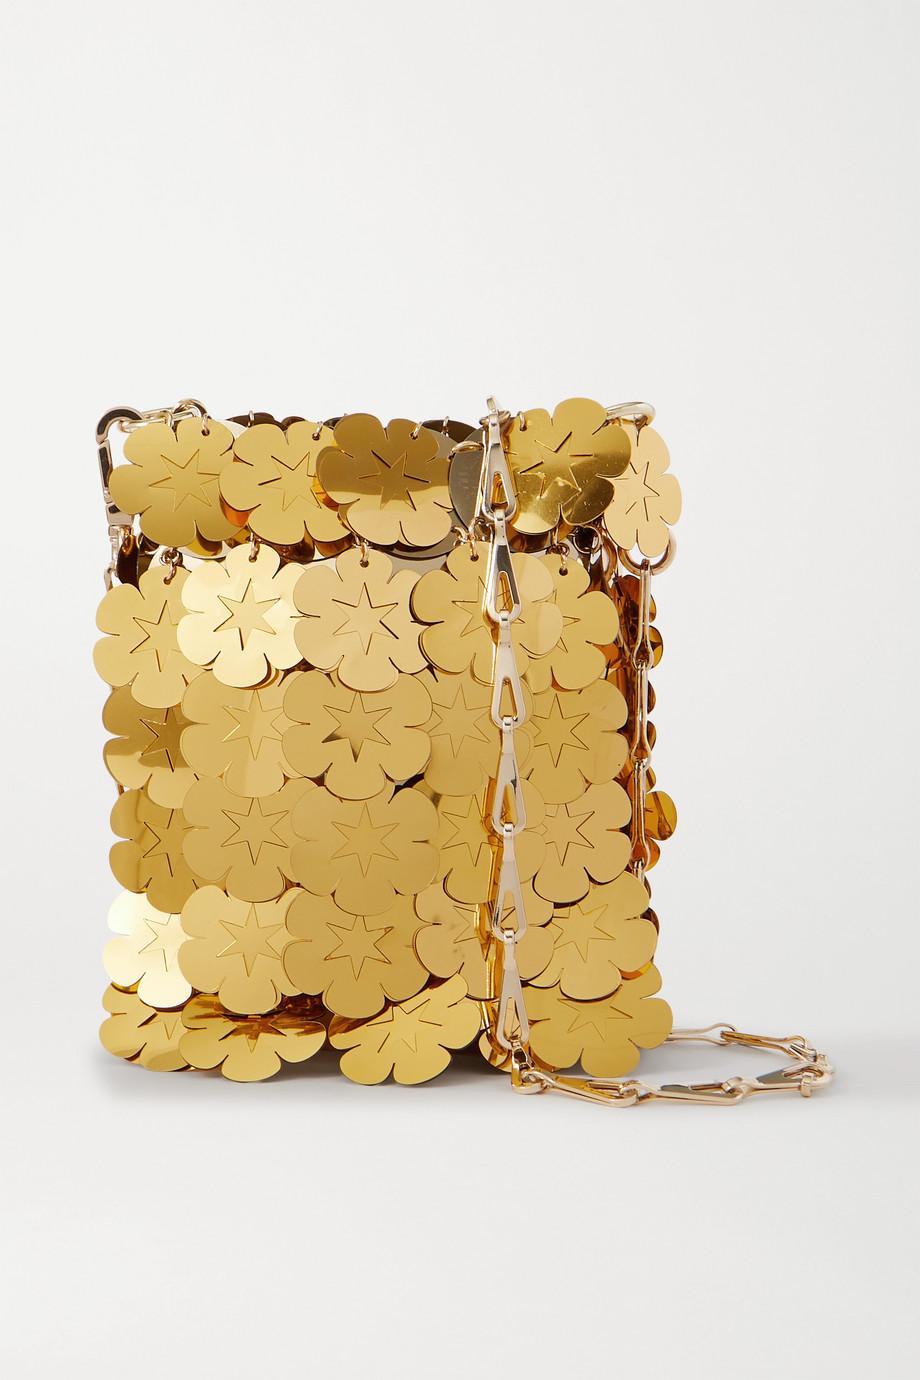 Paco Rabanne Sparkle Mini 1969 亮片缀饰锁子甲单肩包